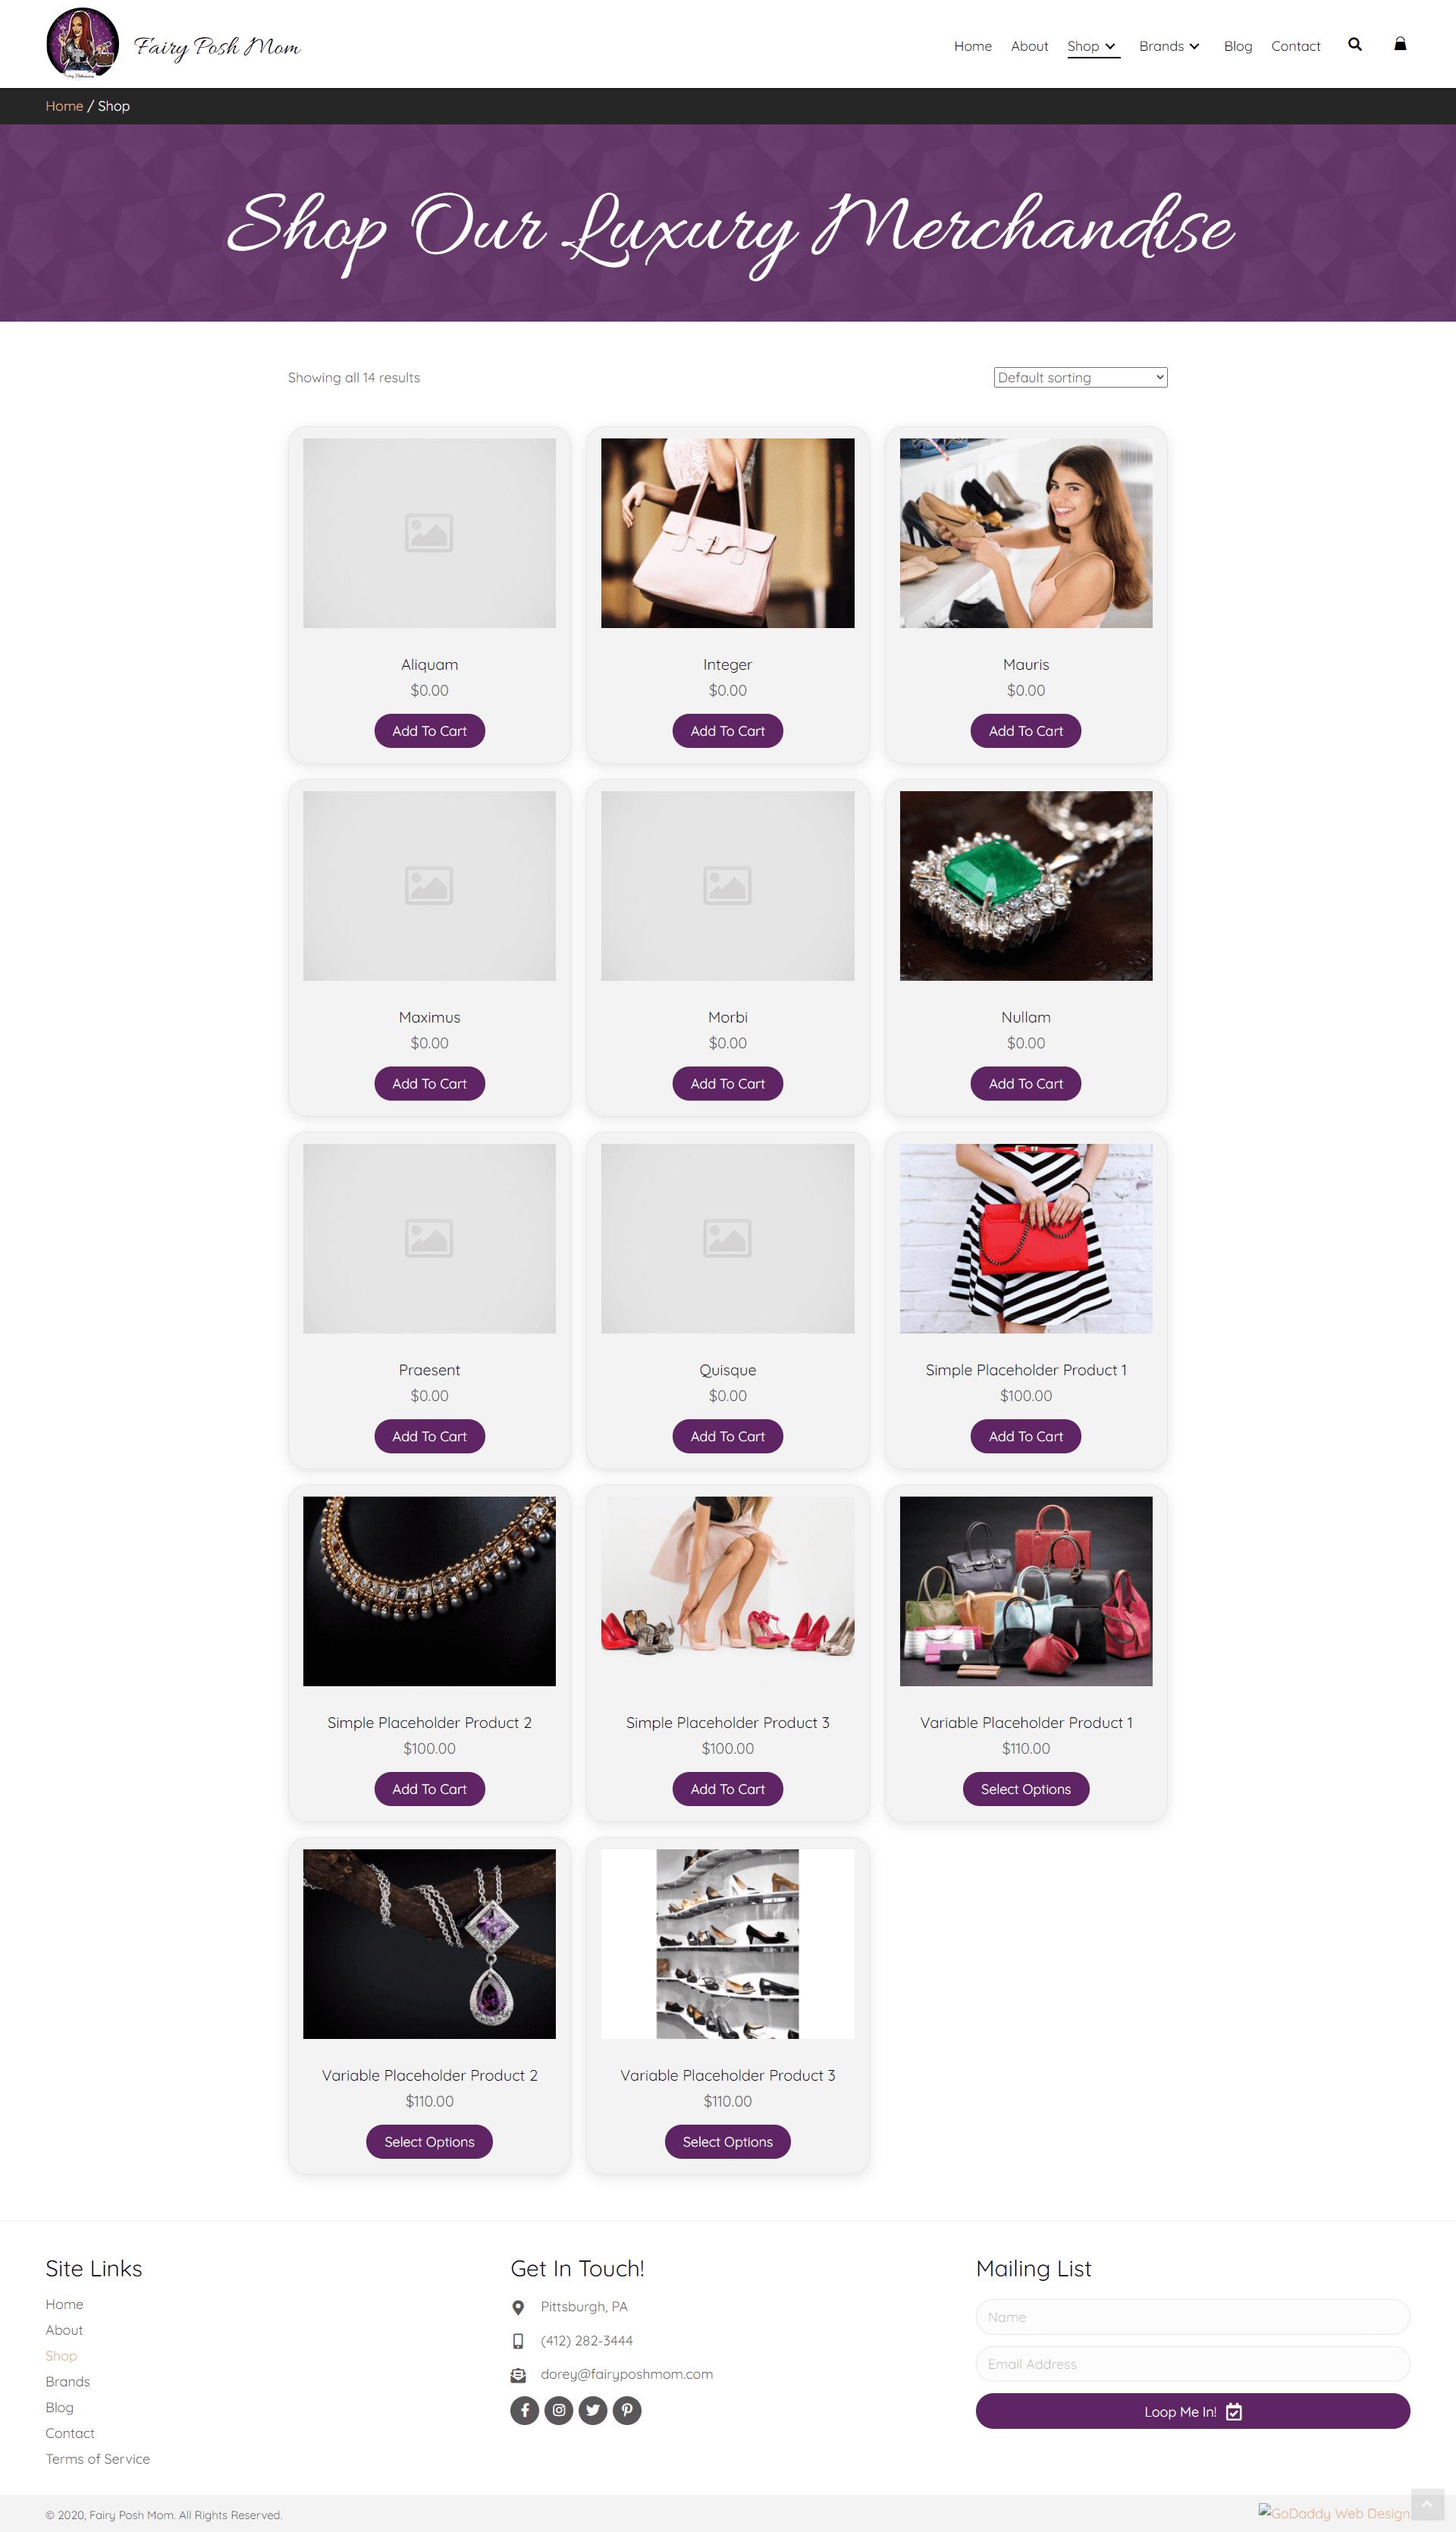 Fairy Posh Mom Shop Page